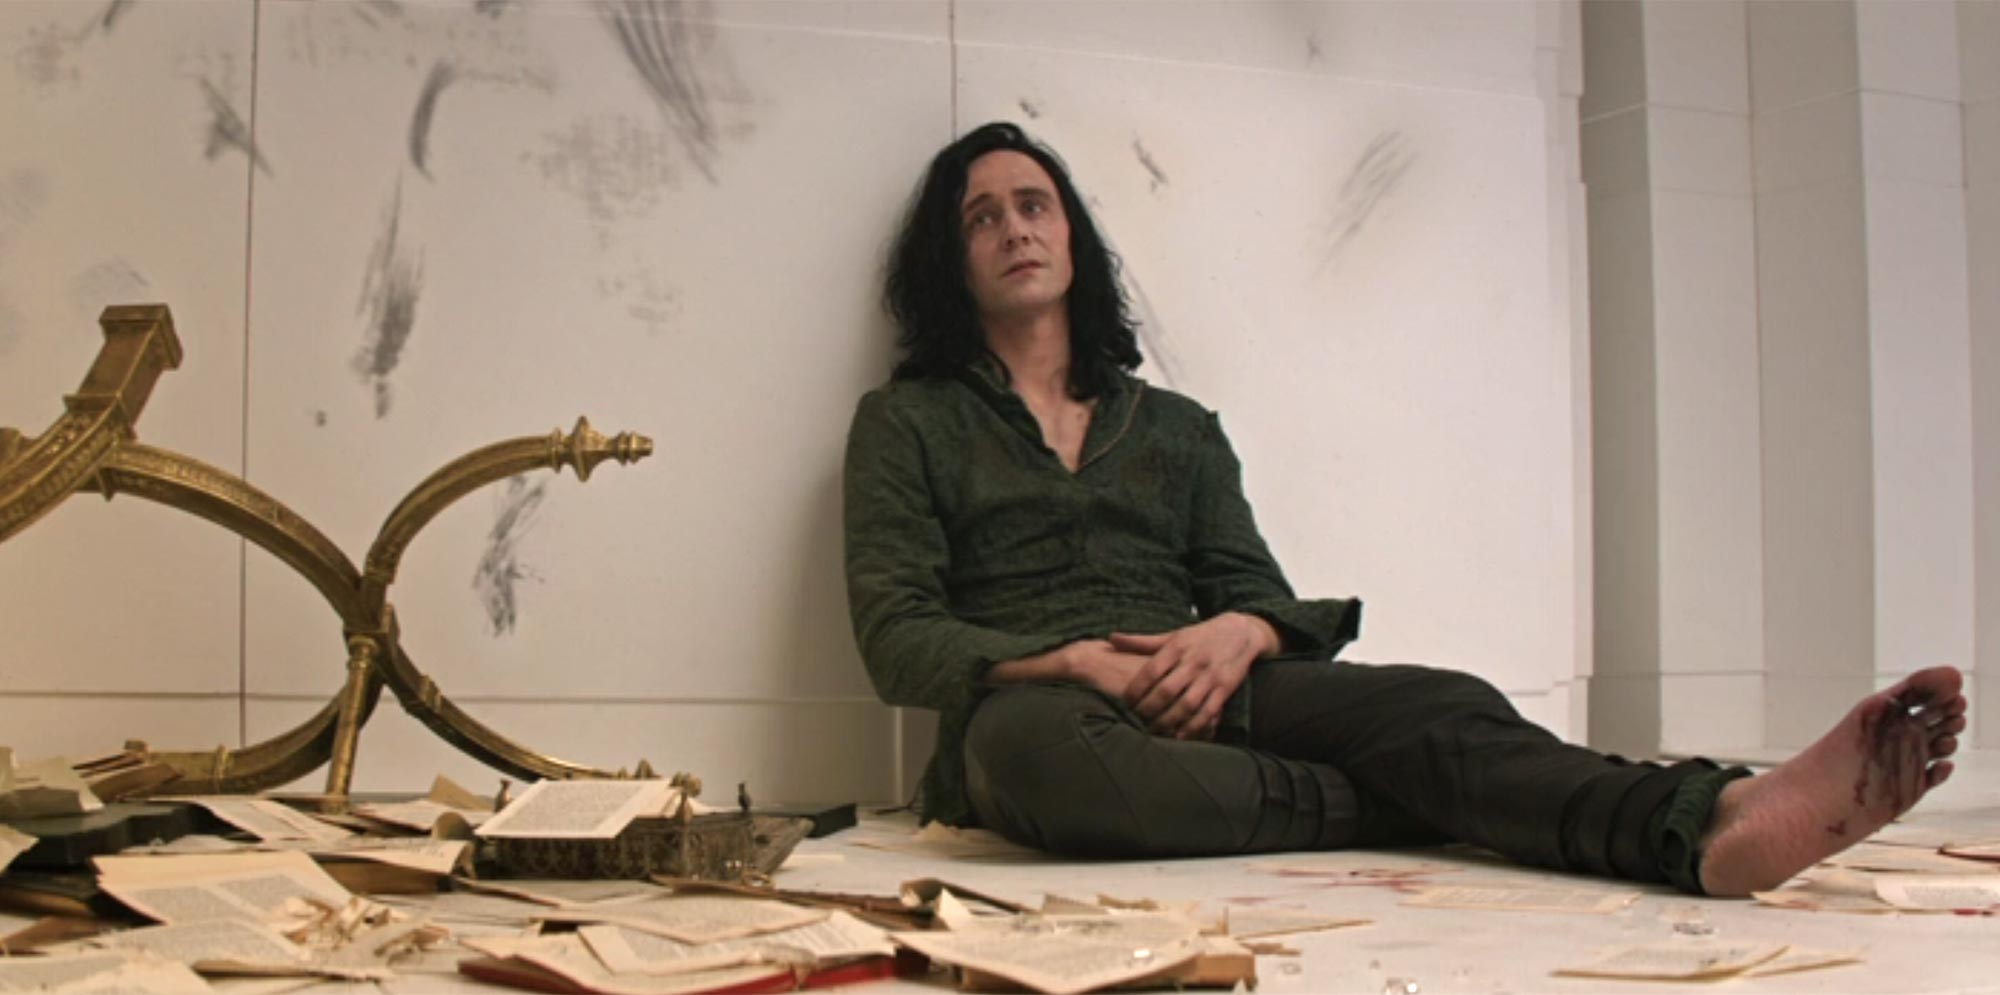 Thor: The Dark World Tom Hiddleston as Loki